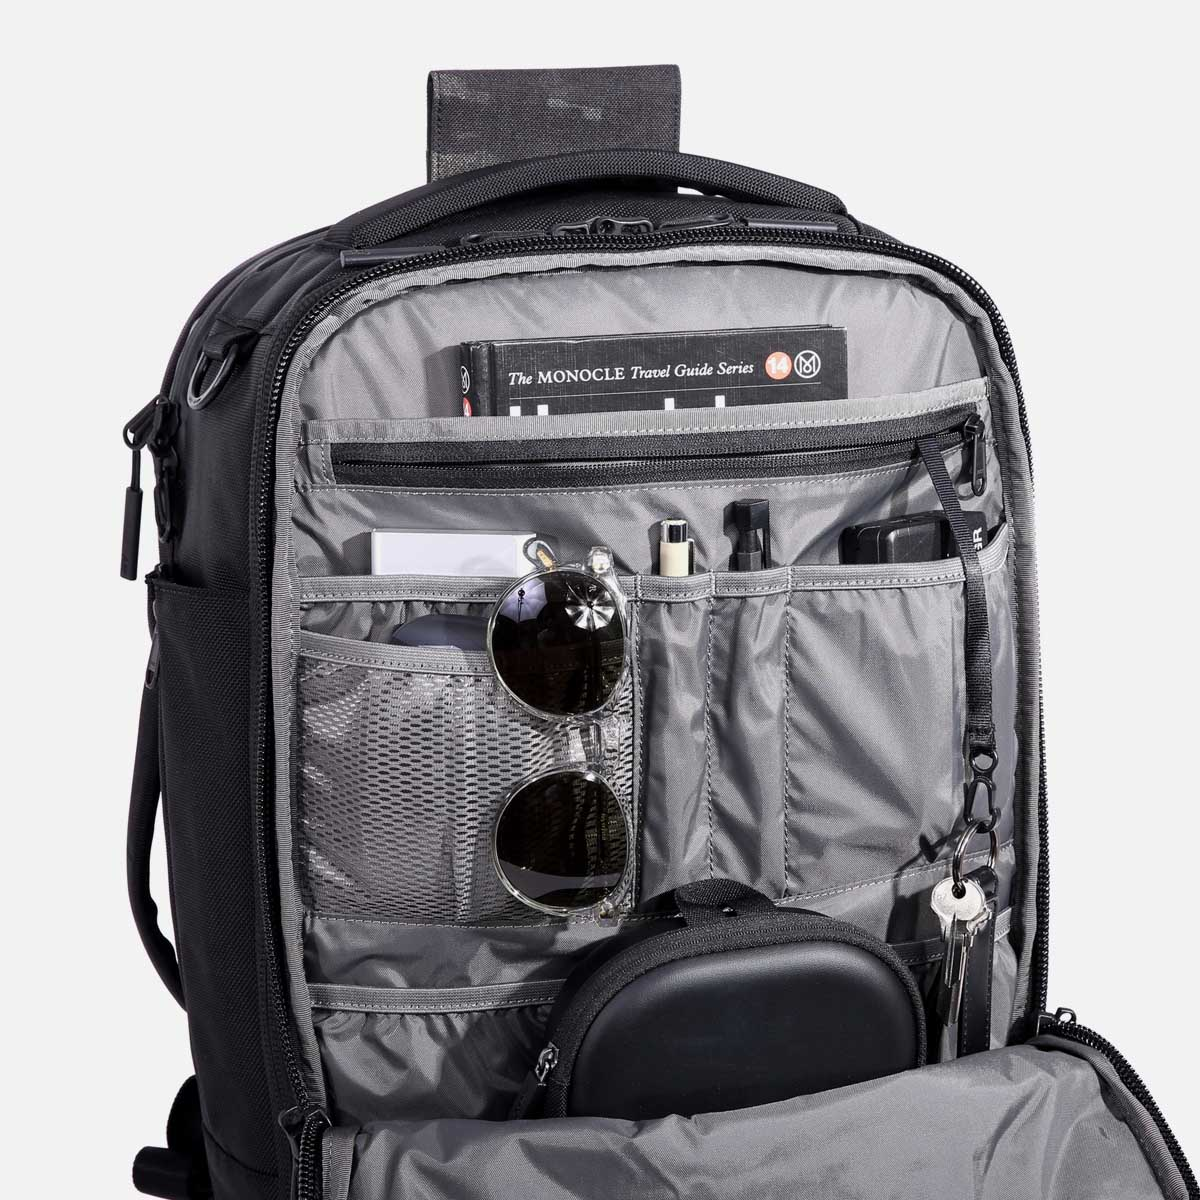 AER21022_travelpack2small_org.jpg